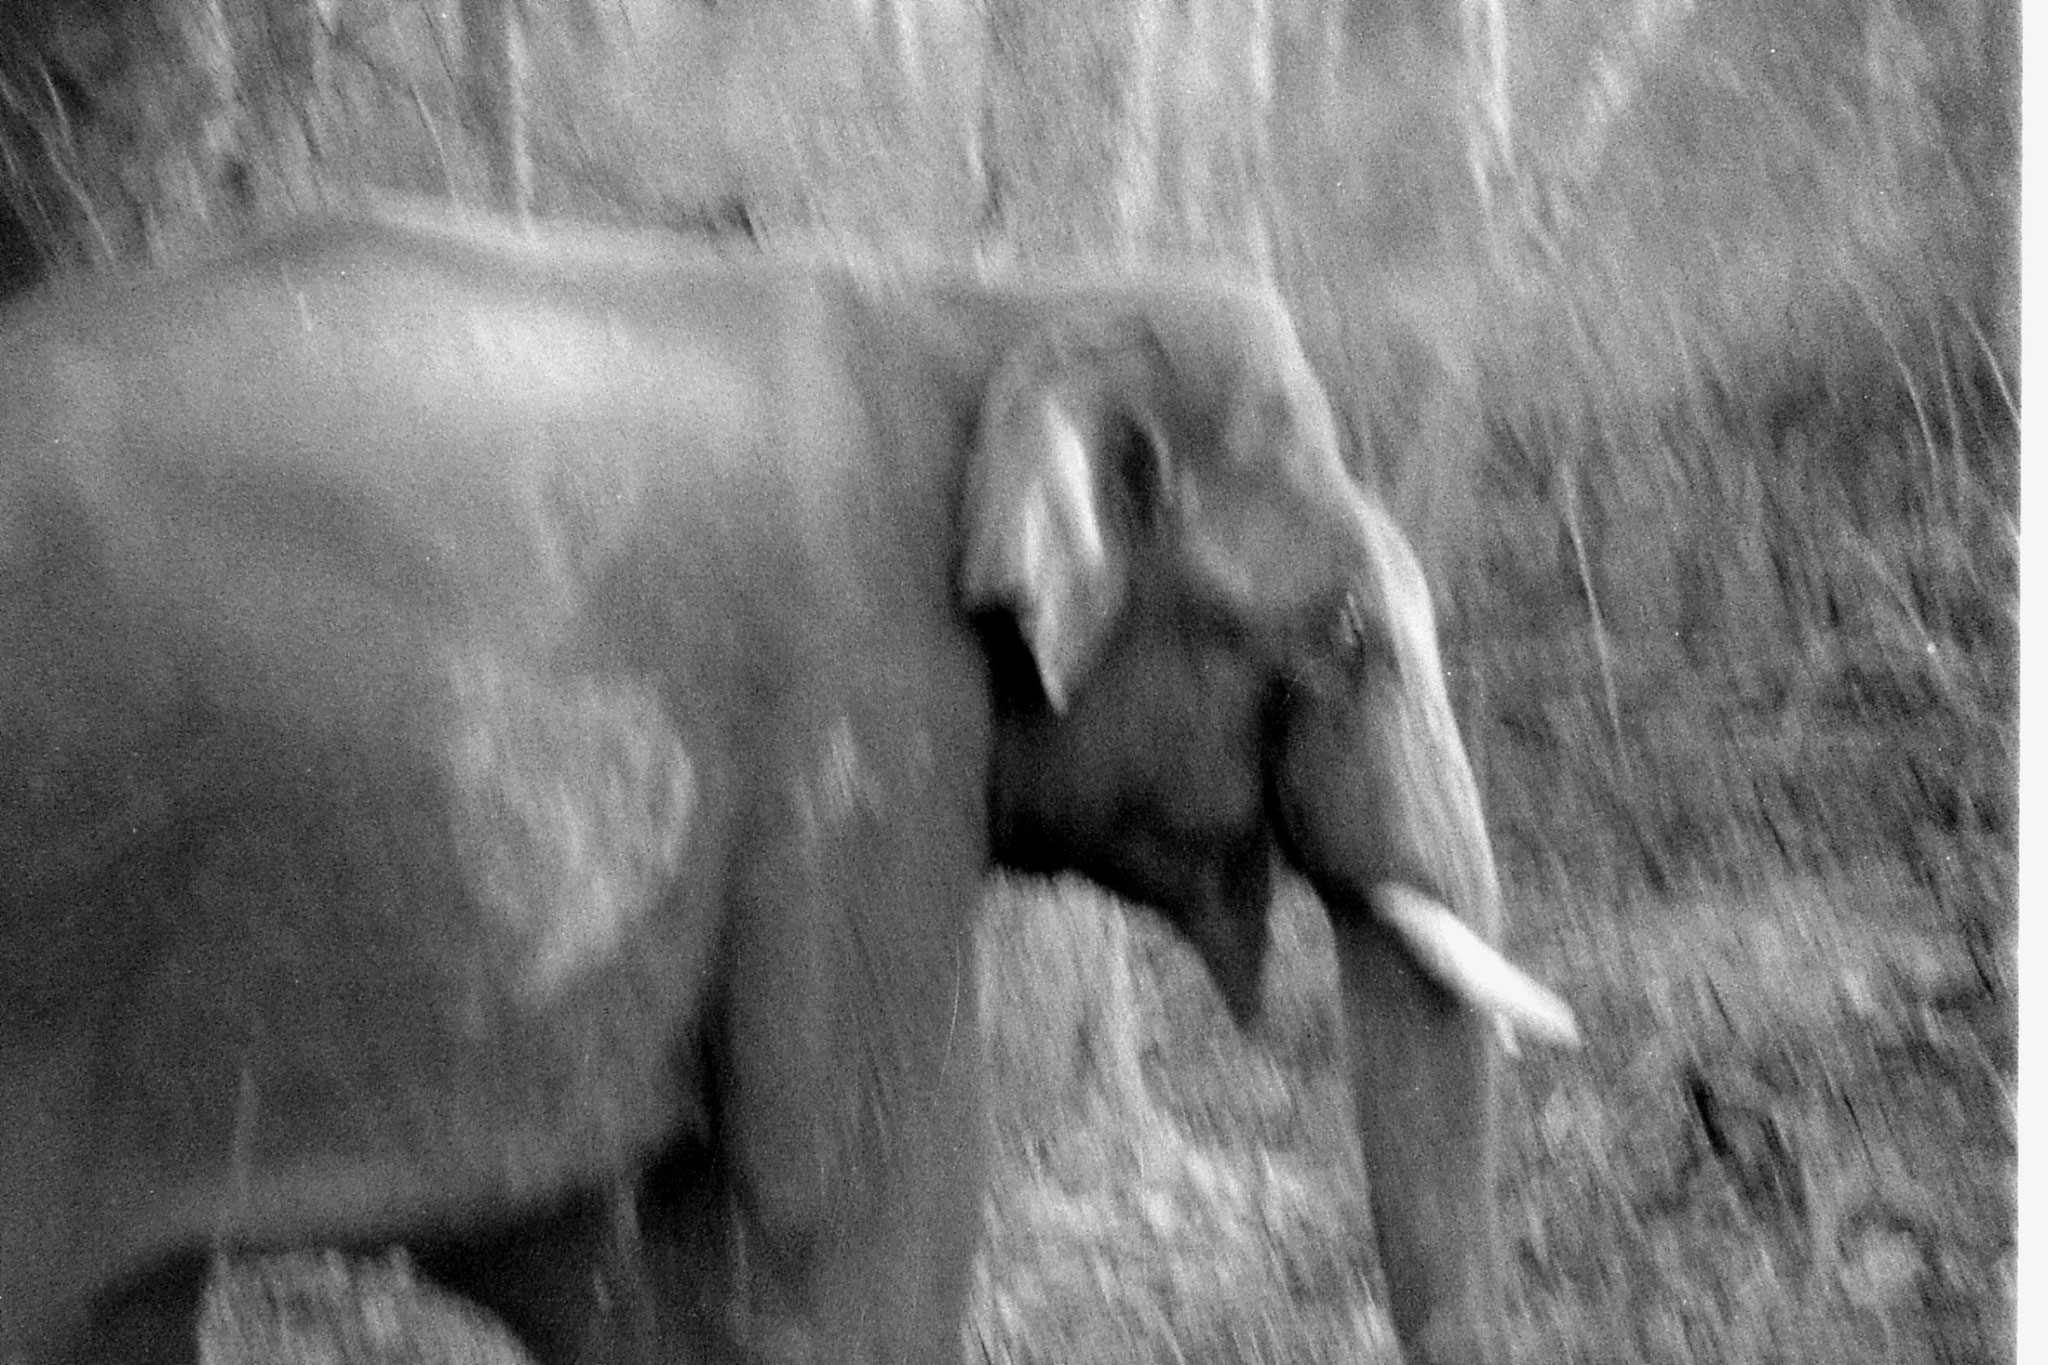 27/2/90: 11: Bandipur elephant